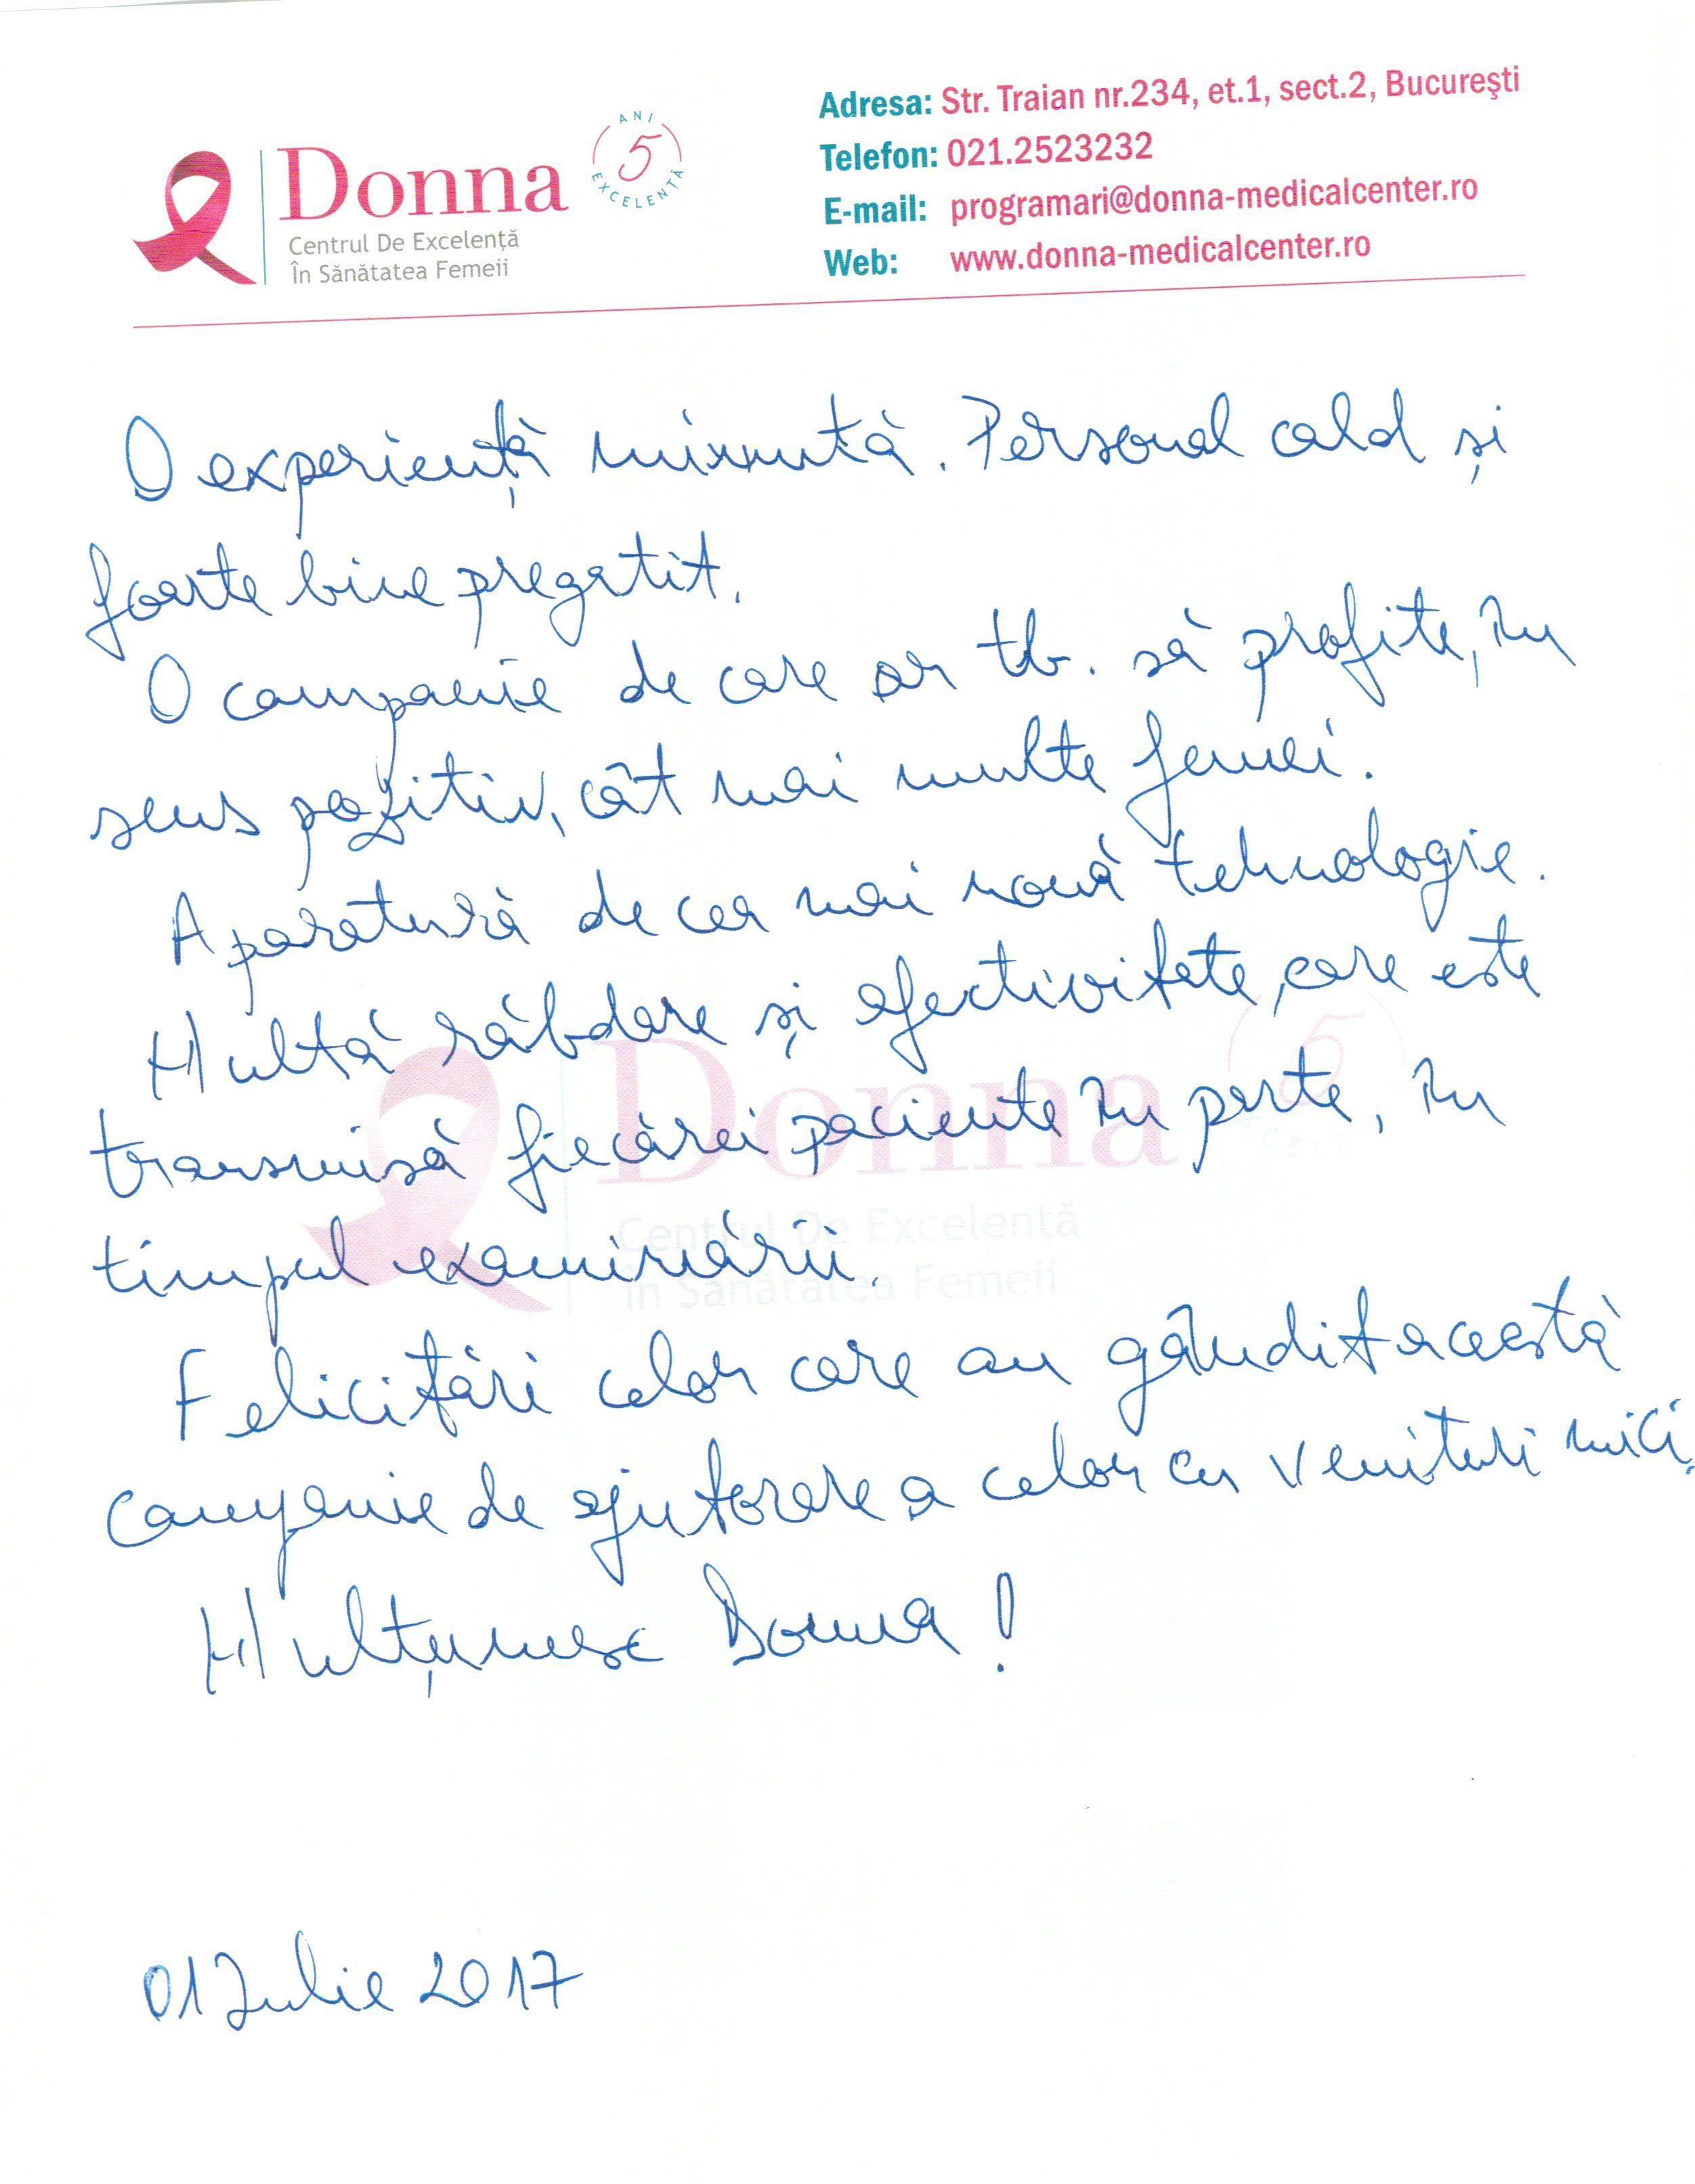 P.V. - Campania MSV, 01.07.2017